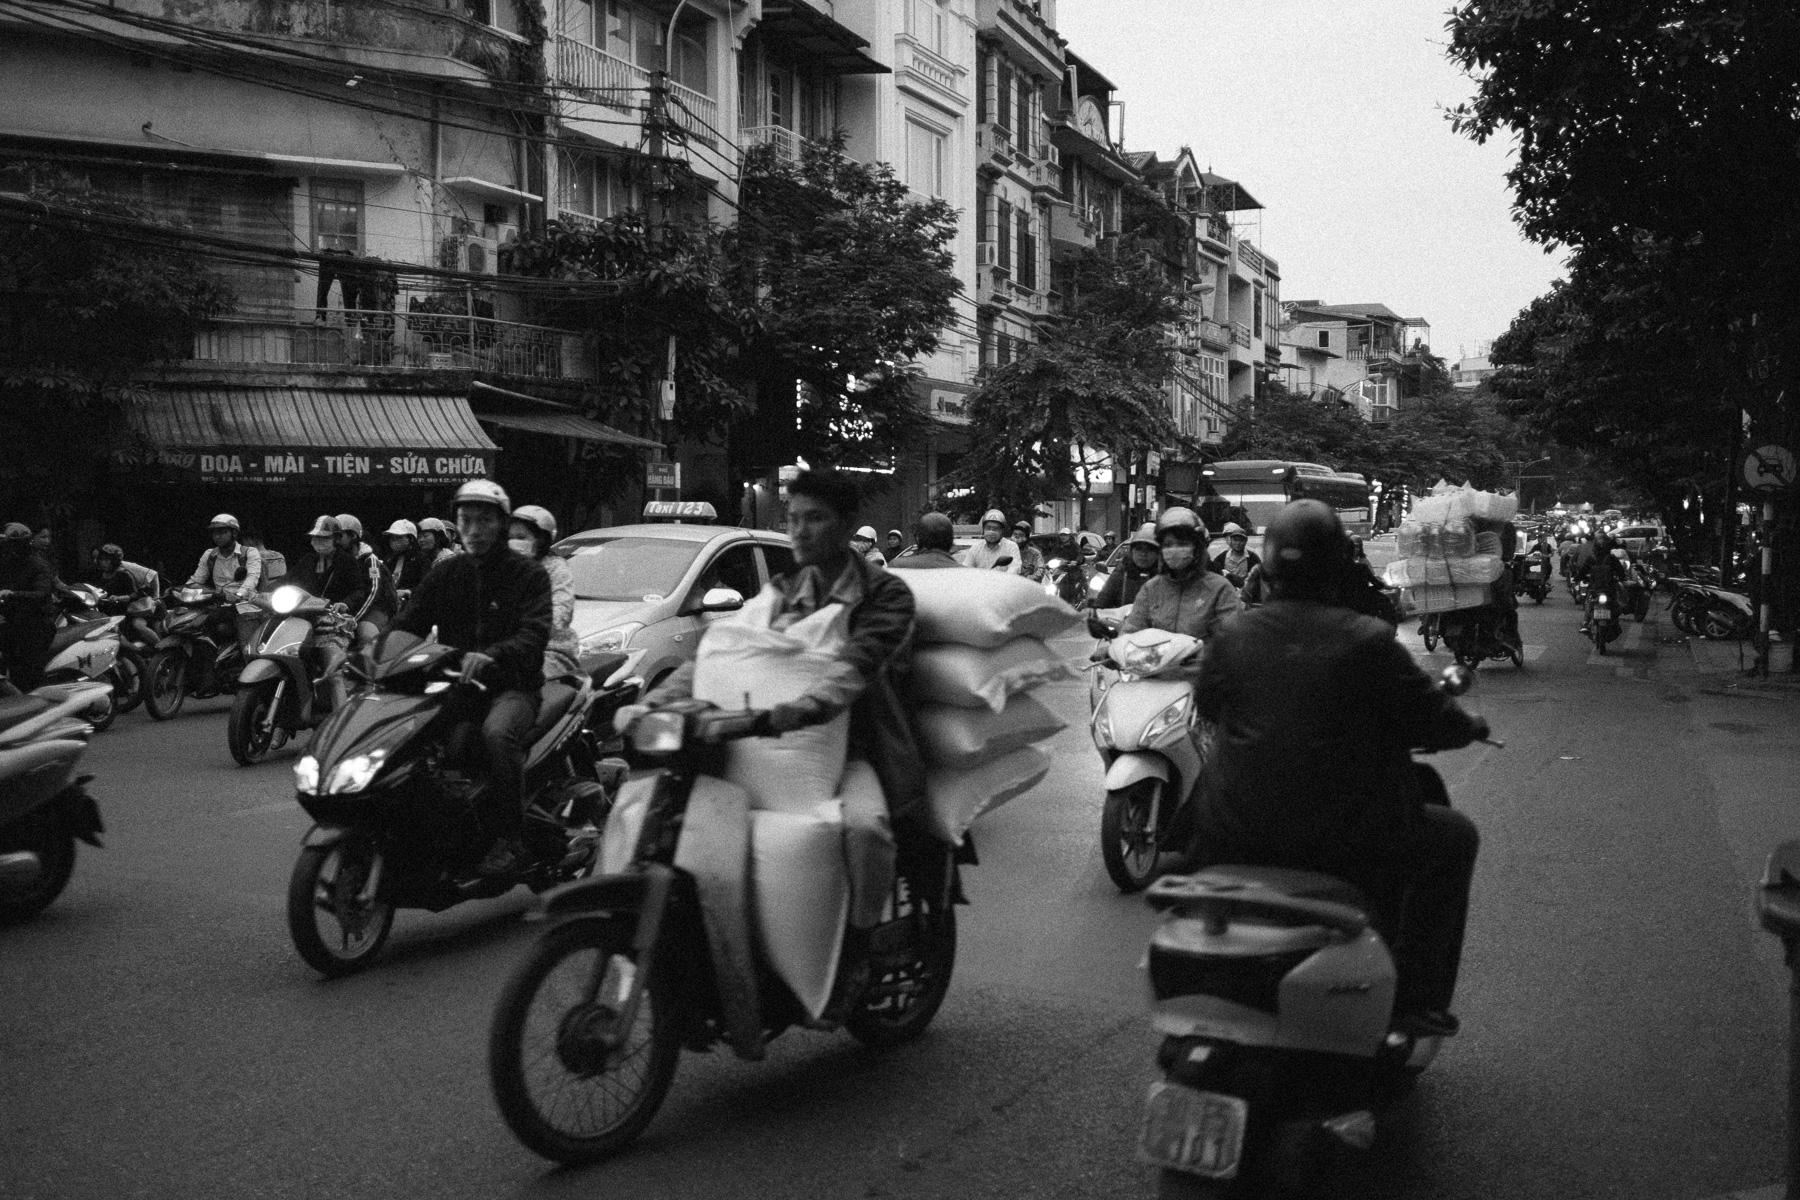 Hikaru Funnell - Capture Collect Photography - Fuji X Pro1 - Fujinon 23mm f-2.0 - Vietnam - October 2018 31.jpg